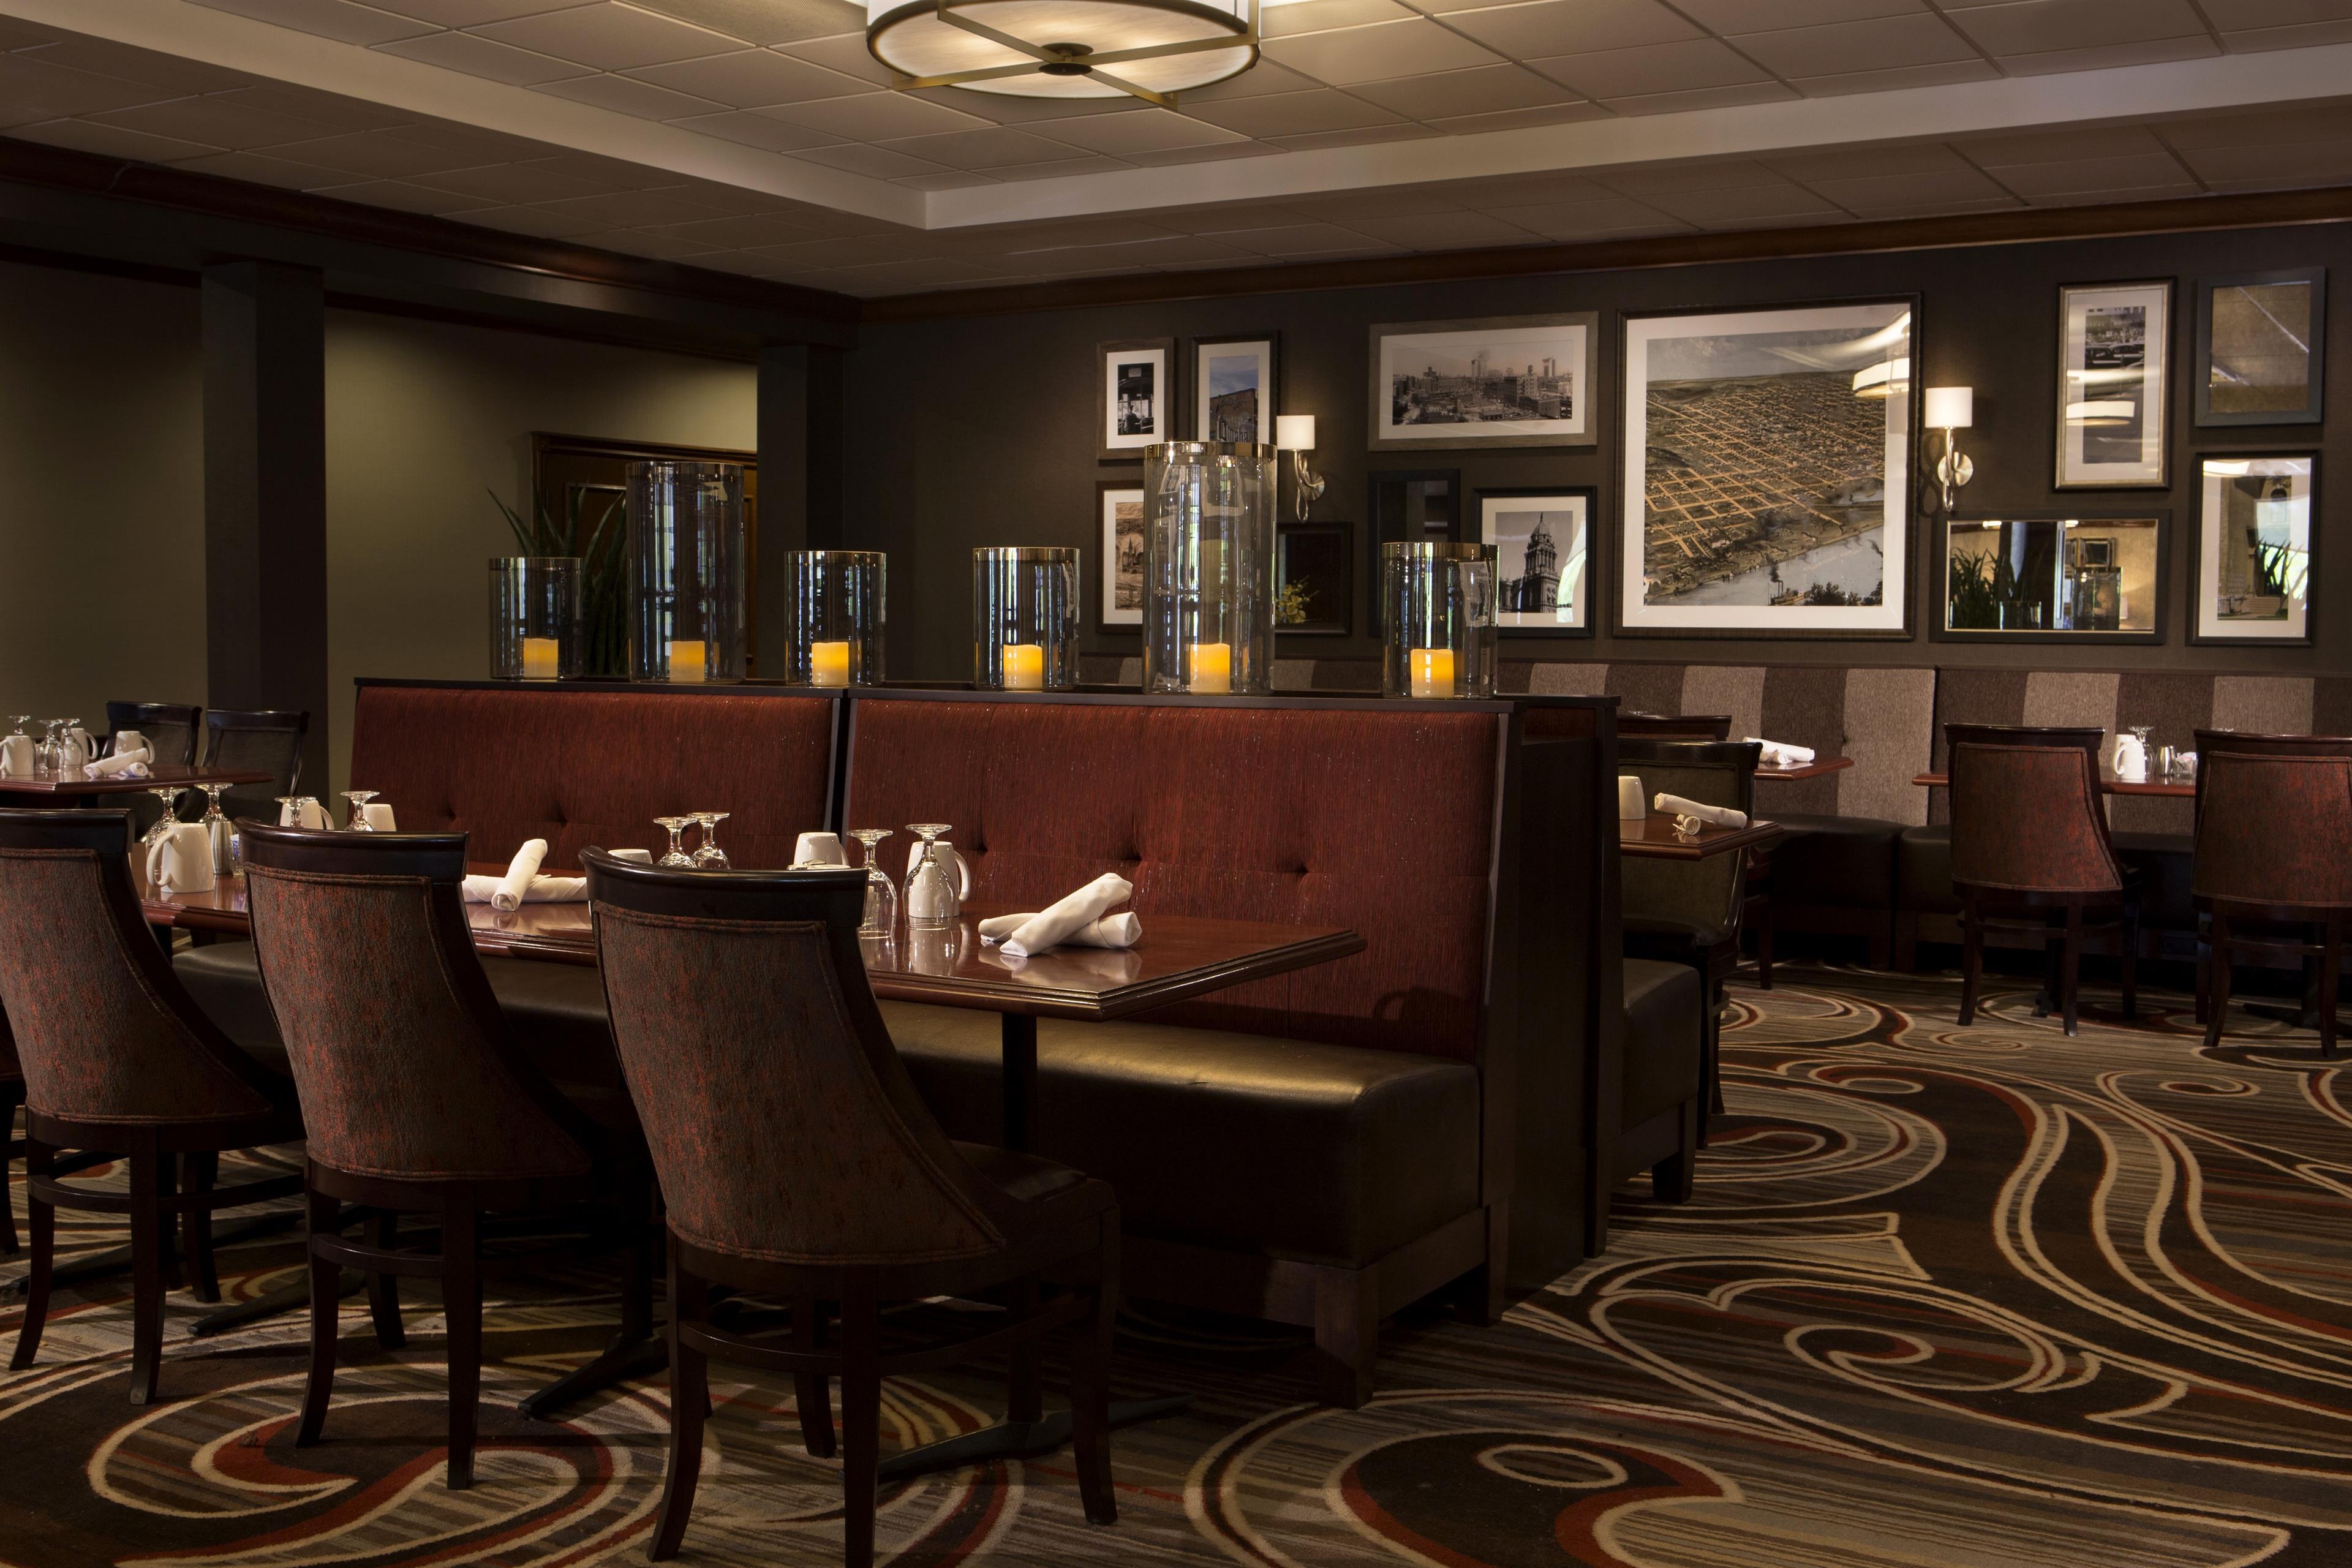 Sheraton Omaha Hotel image 15